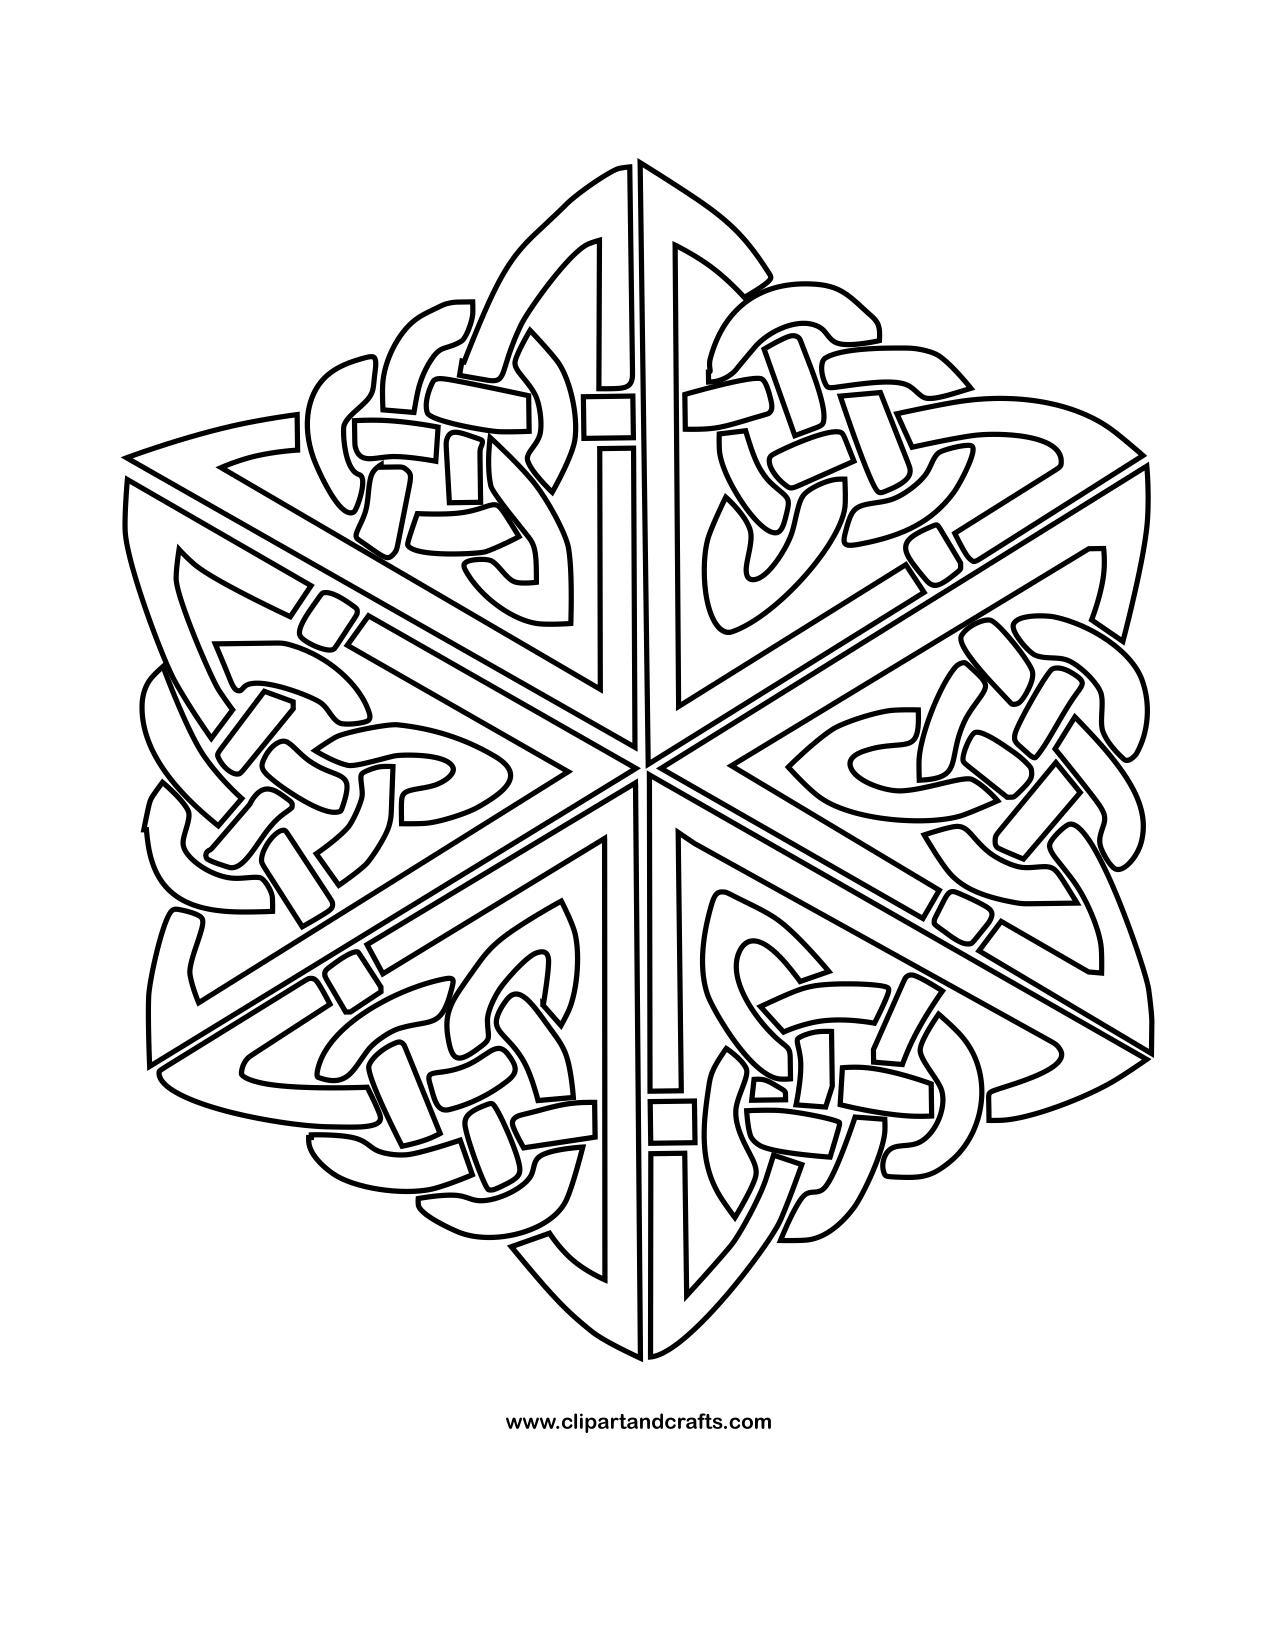 celtic art colouring pages mandala monday more free celtic mandalas to color pages colouring art celtic